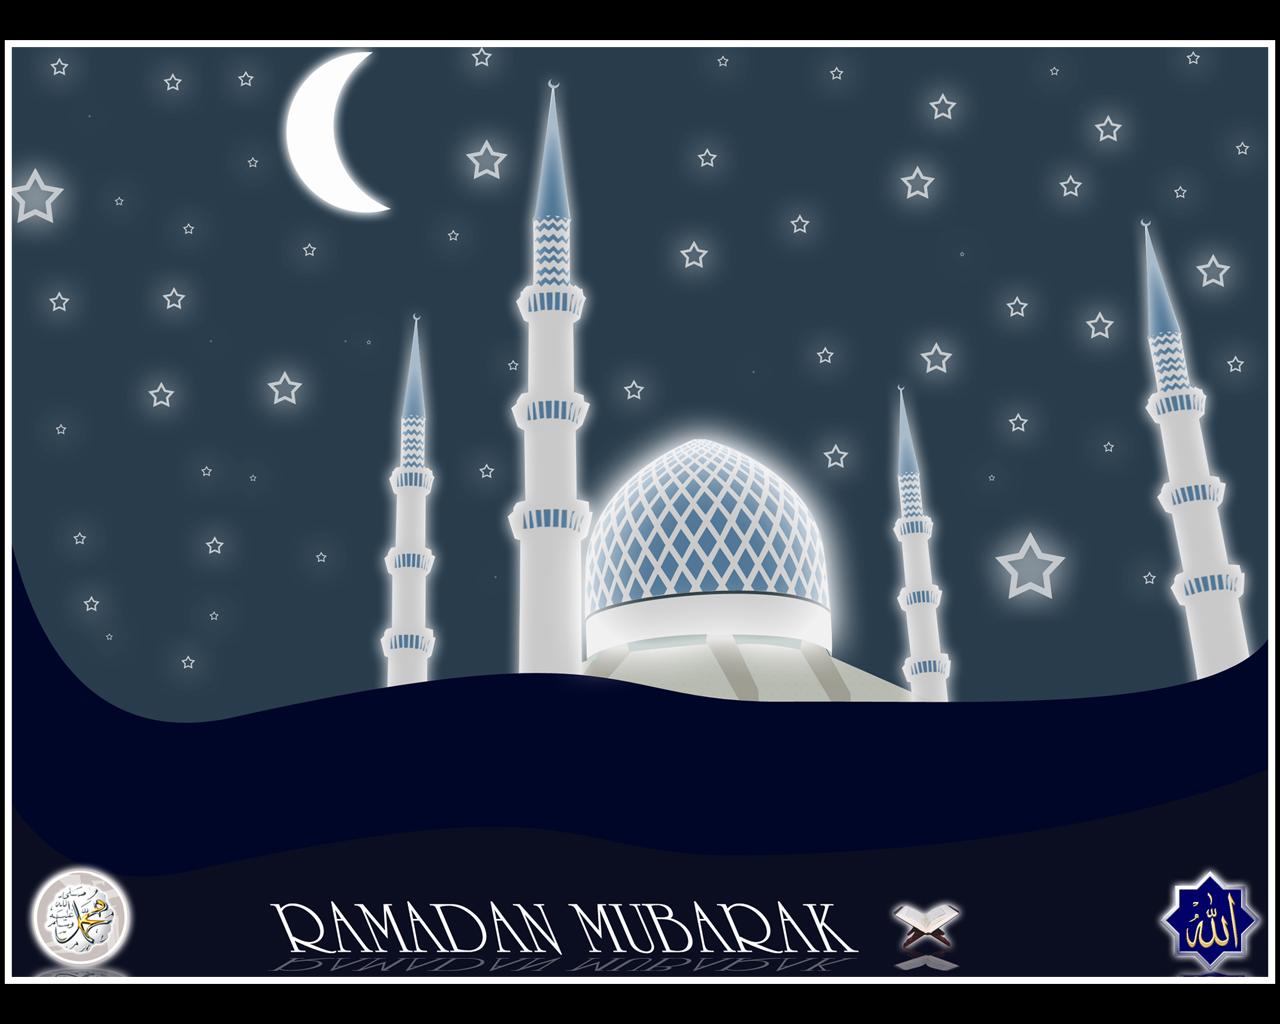 http://2.bp.blogspot.com/-VKF54sjZCHA/TjeMGz6cEjI/AAAAAAAABcY/kAErQ46LtLc/s1600/ramadan-mubarak-islamv2.jpg